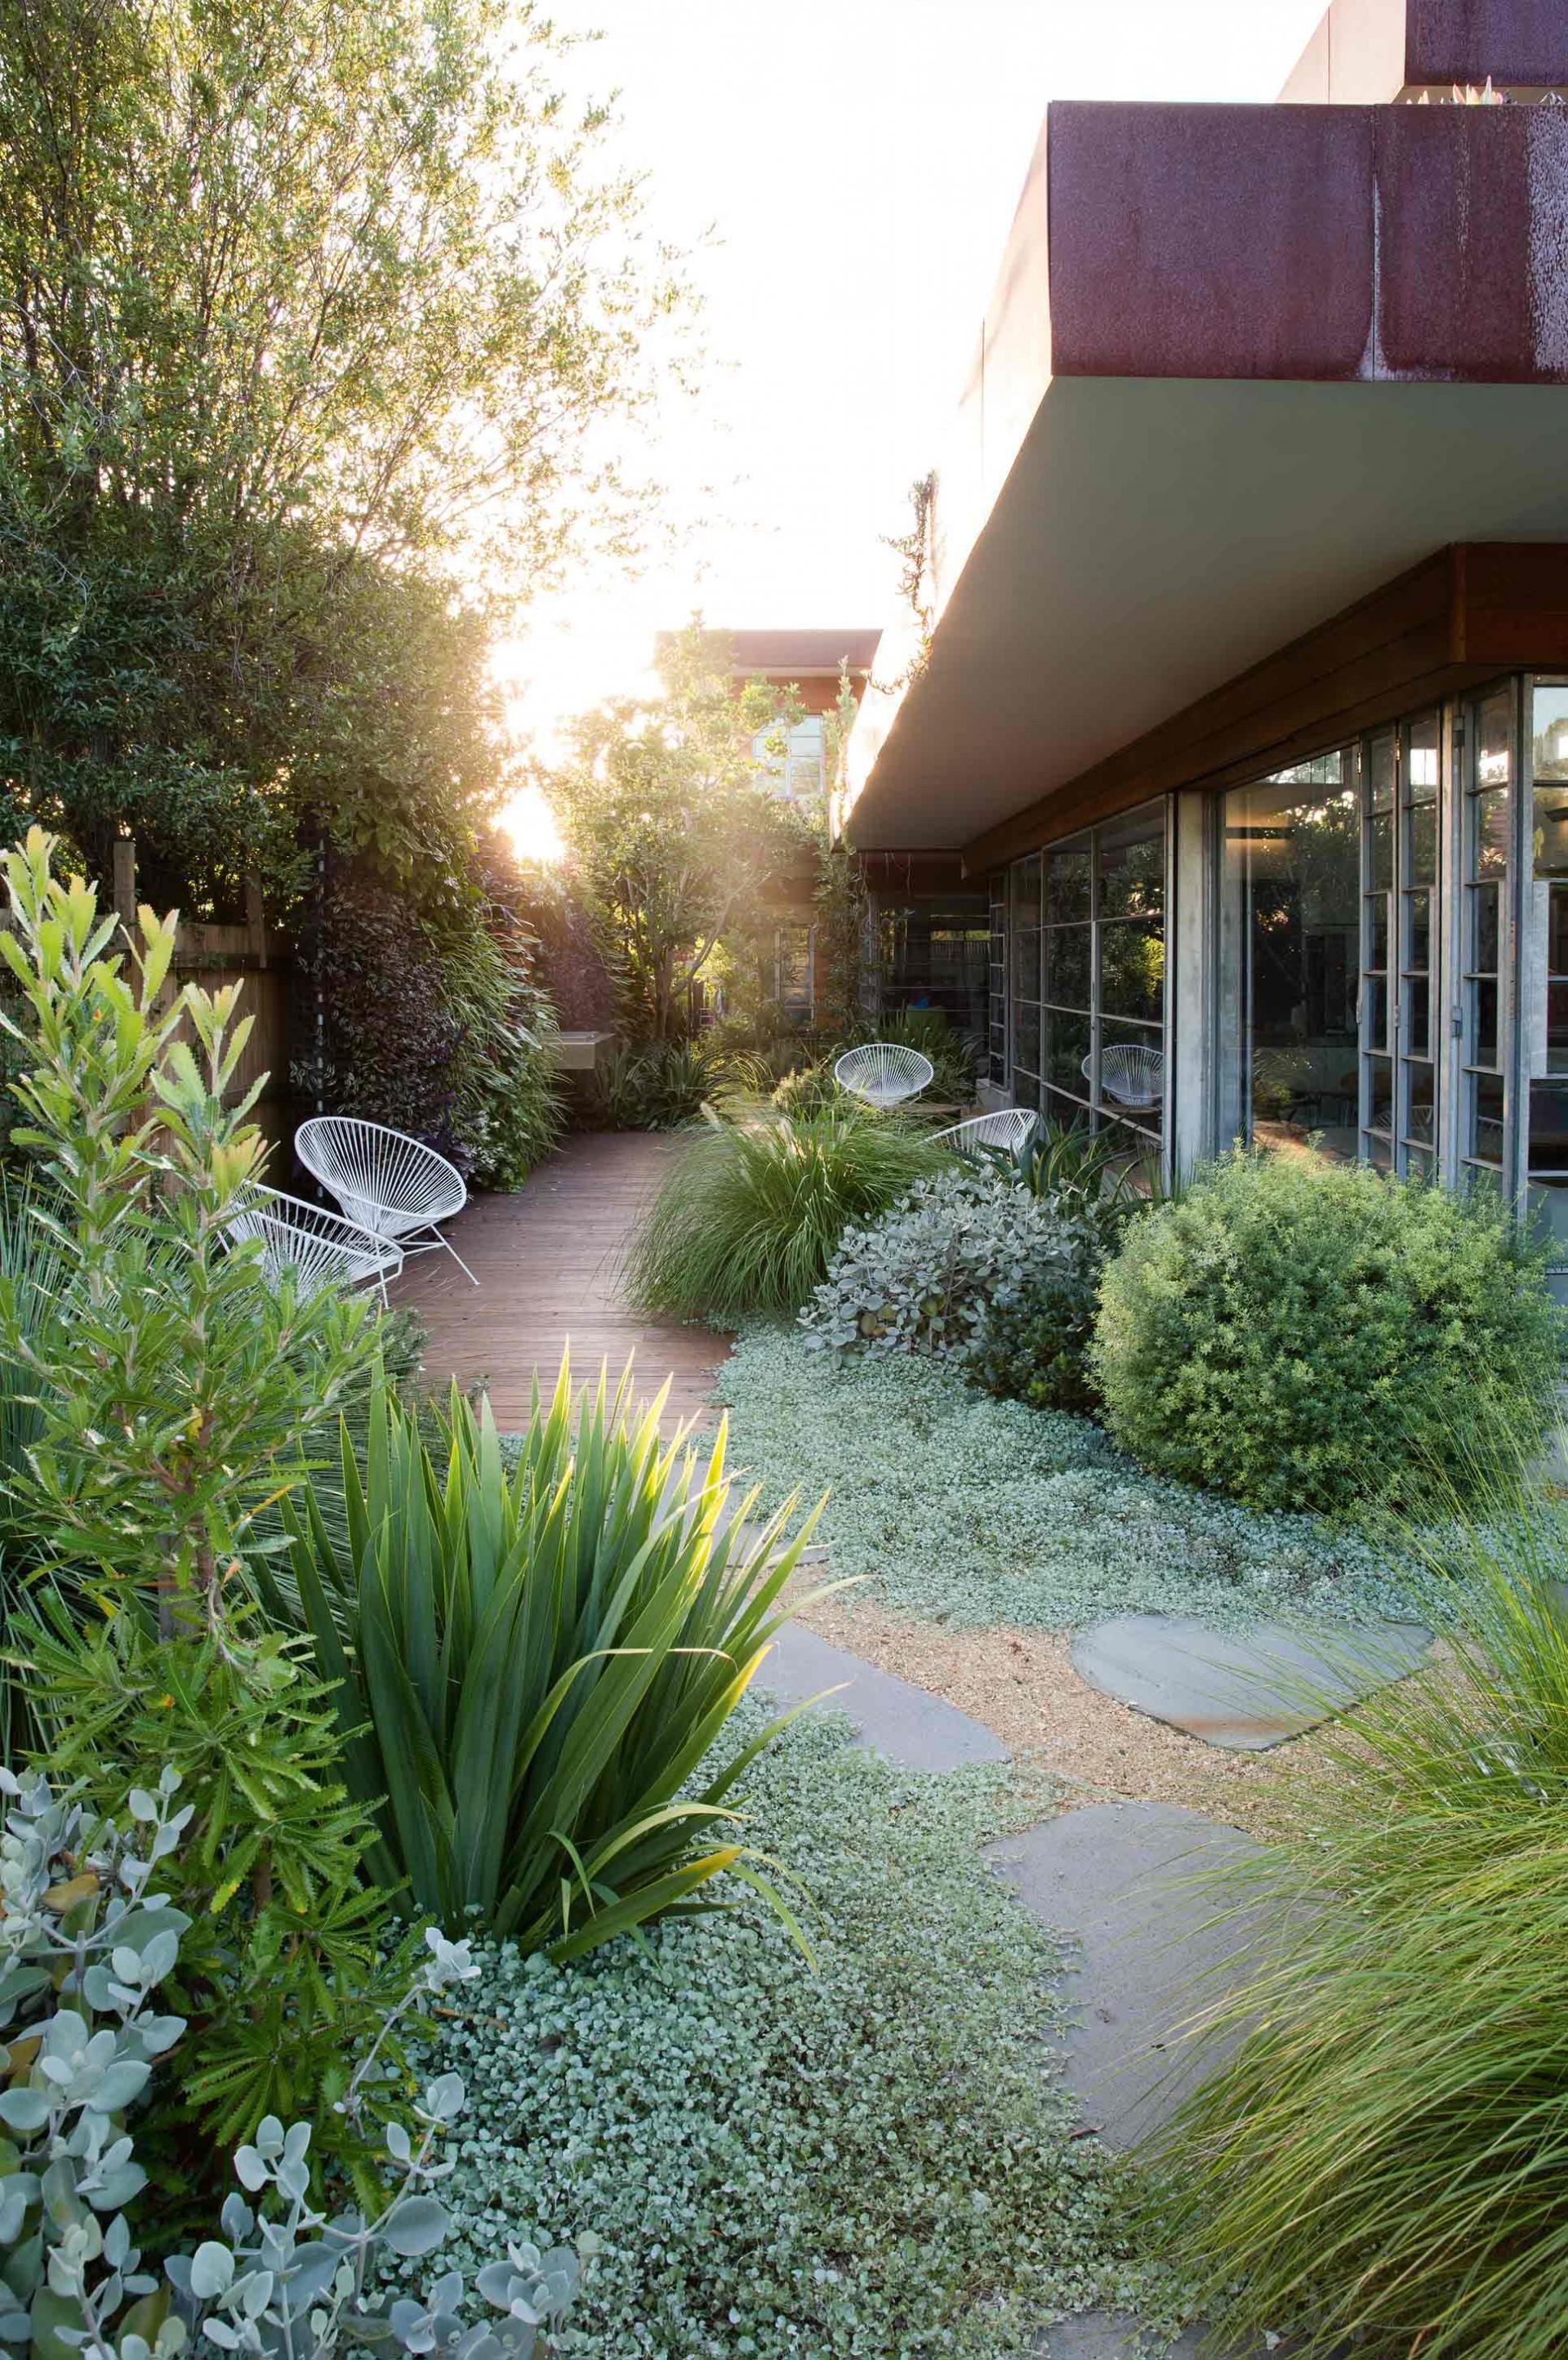 Courtyard garden by landscape deisgner Peter Fudge Photography by